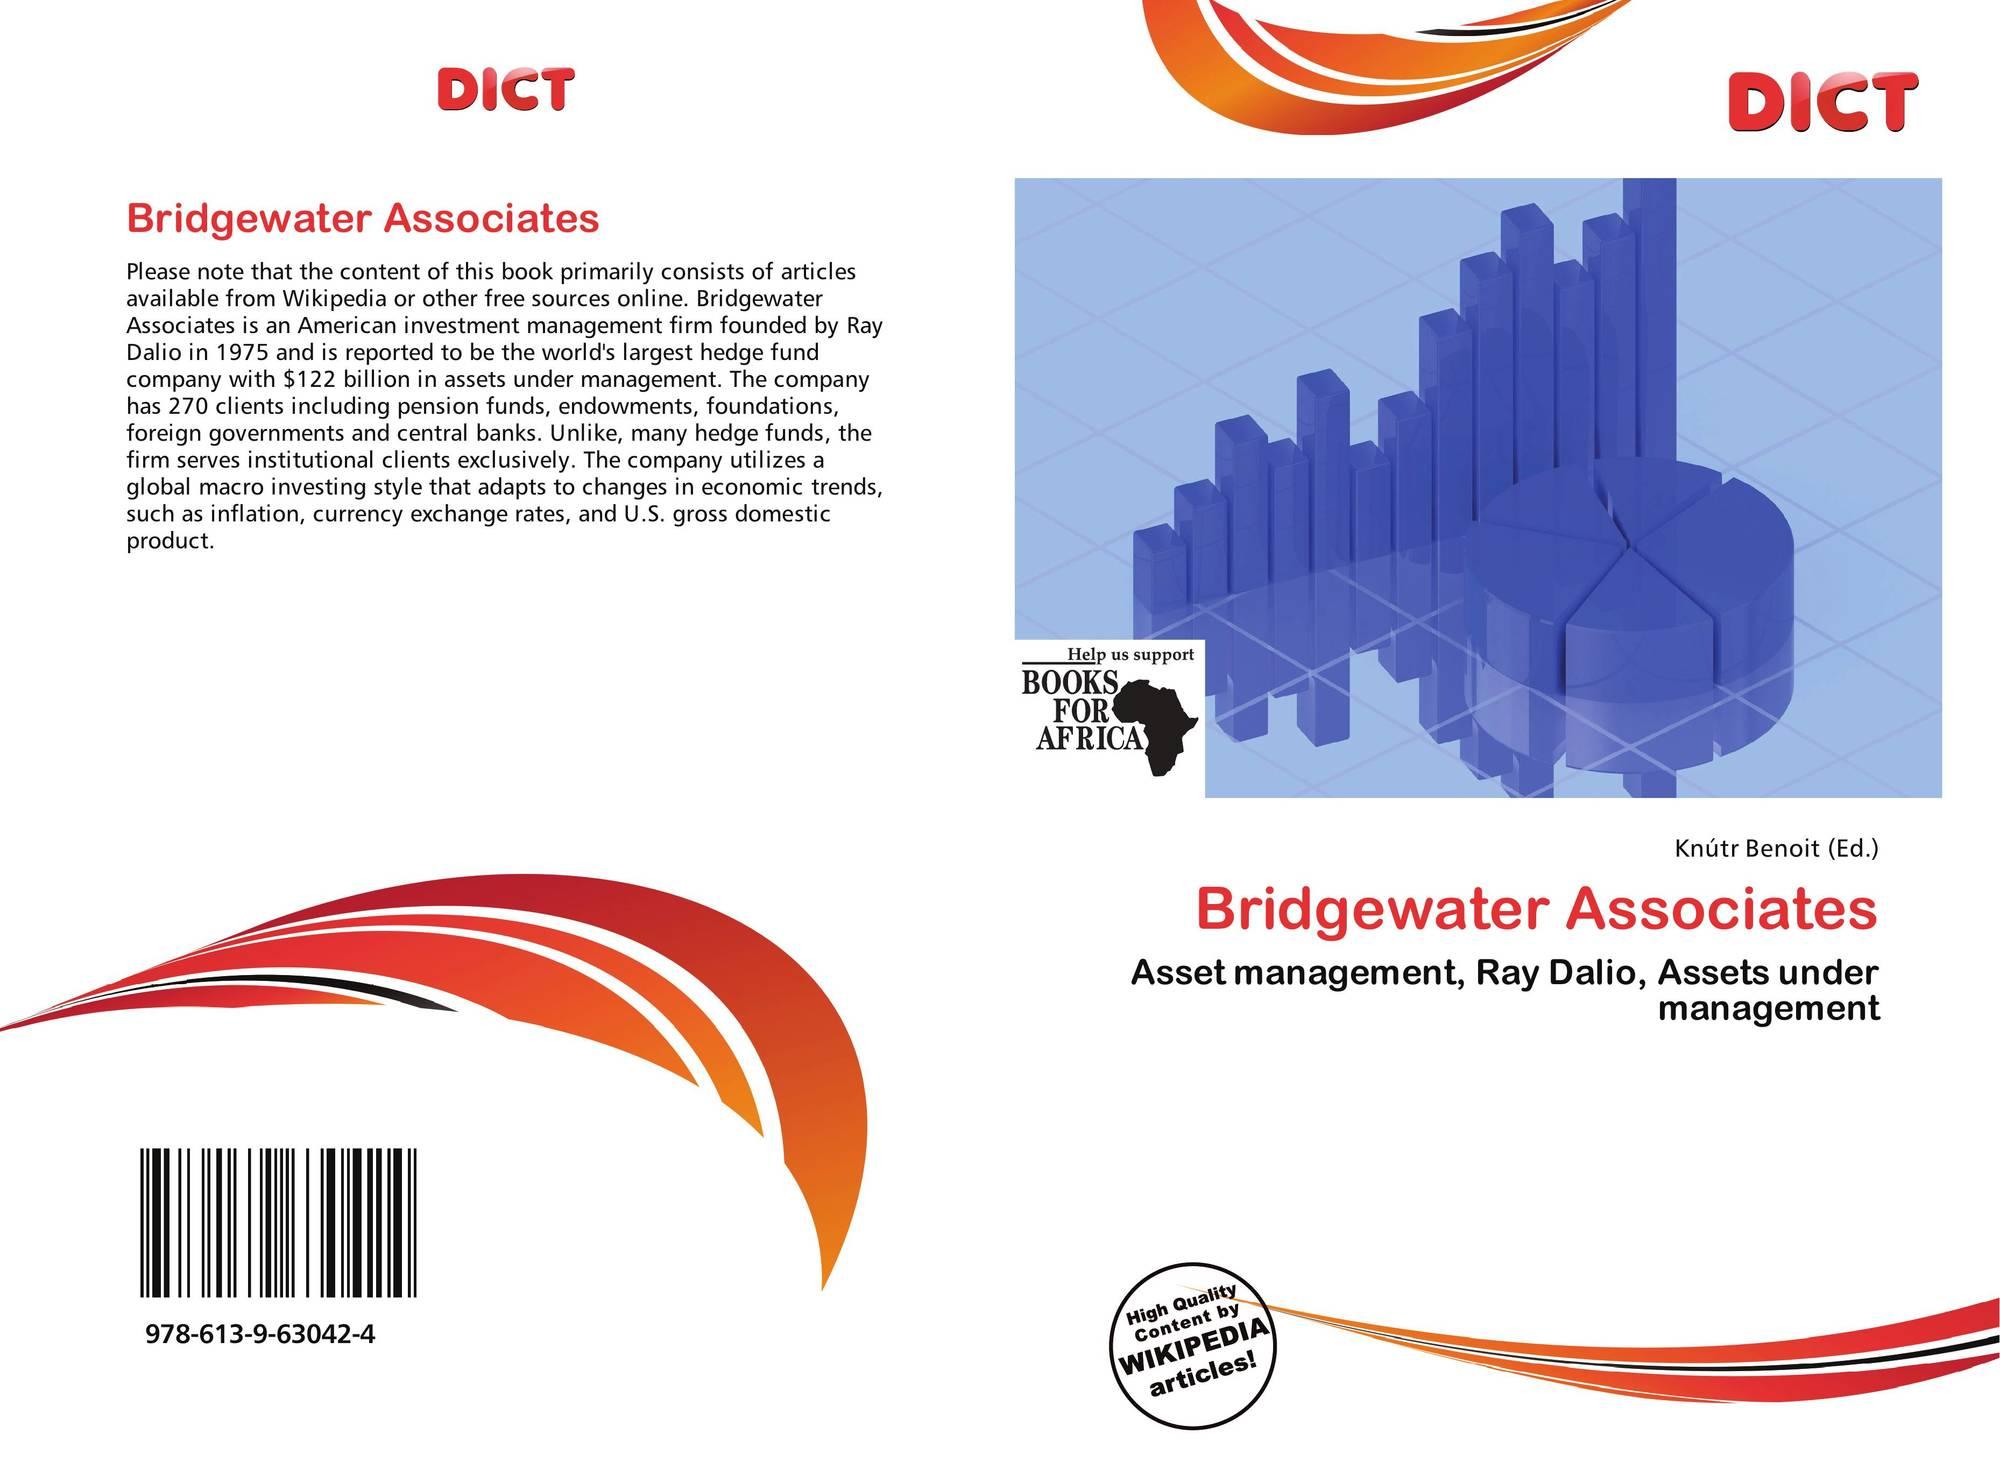 Bridgewater Associates, 978-613-9-63042-4, 6139630428